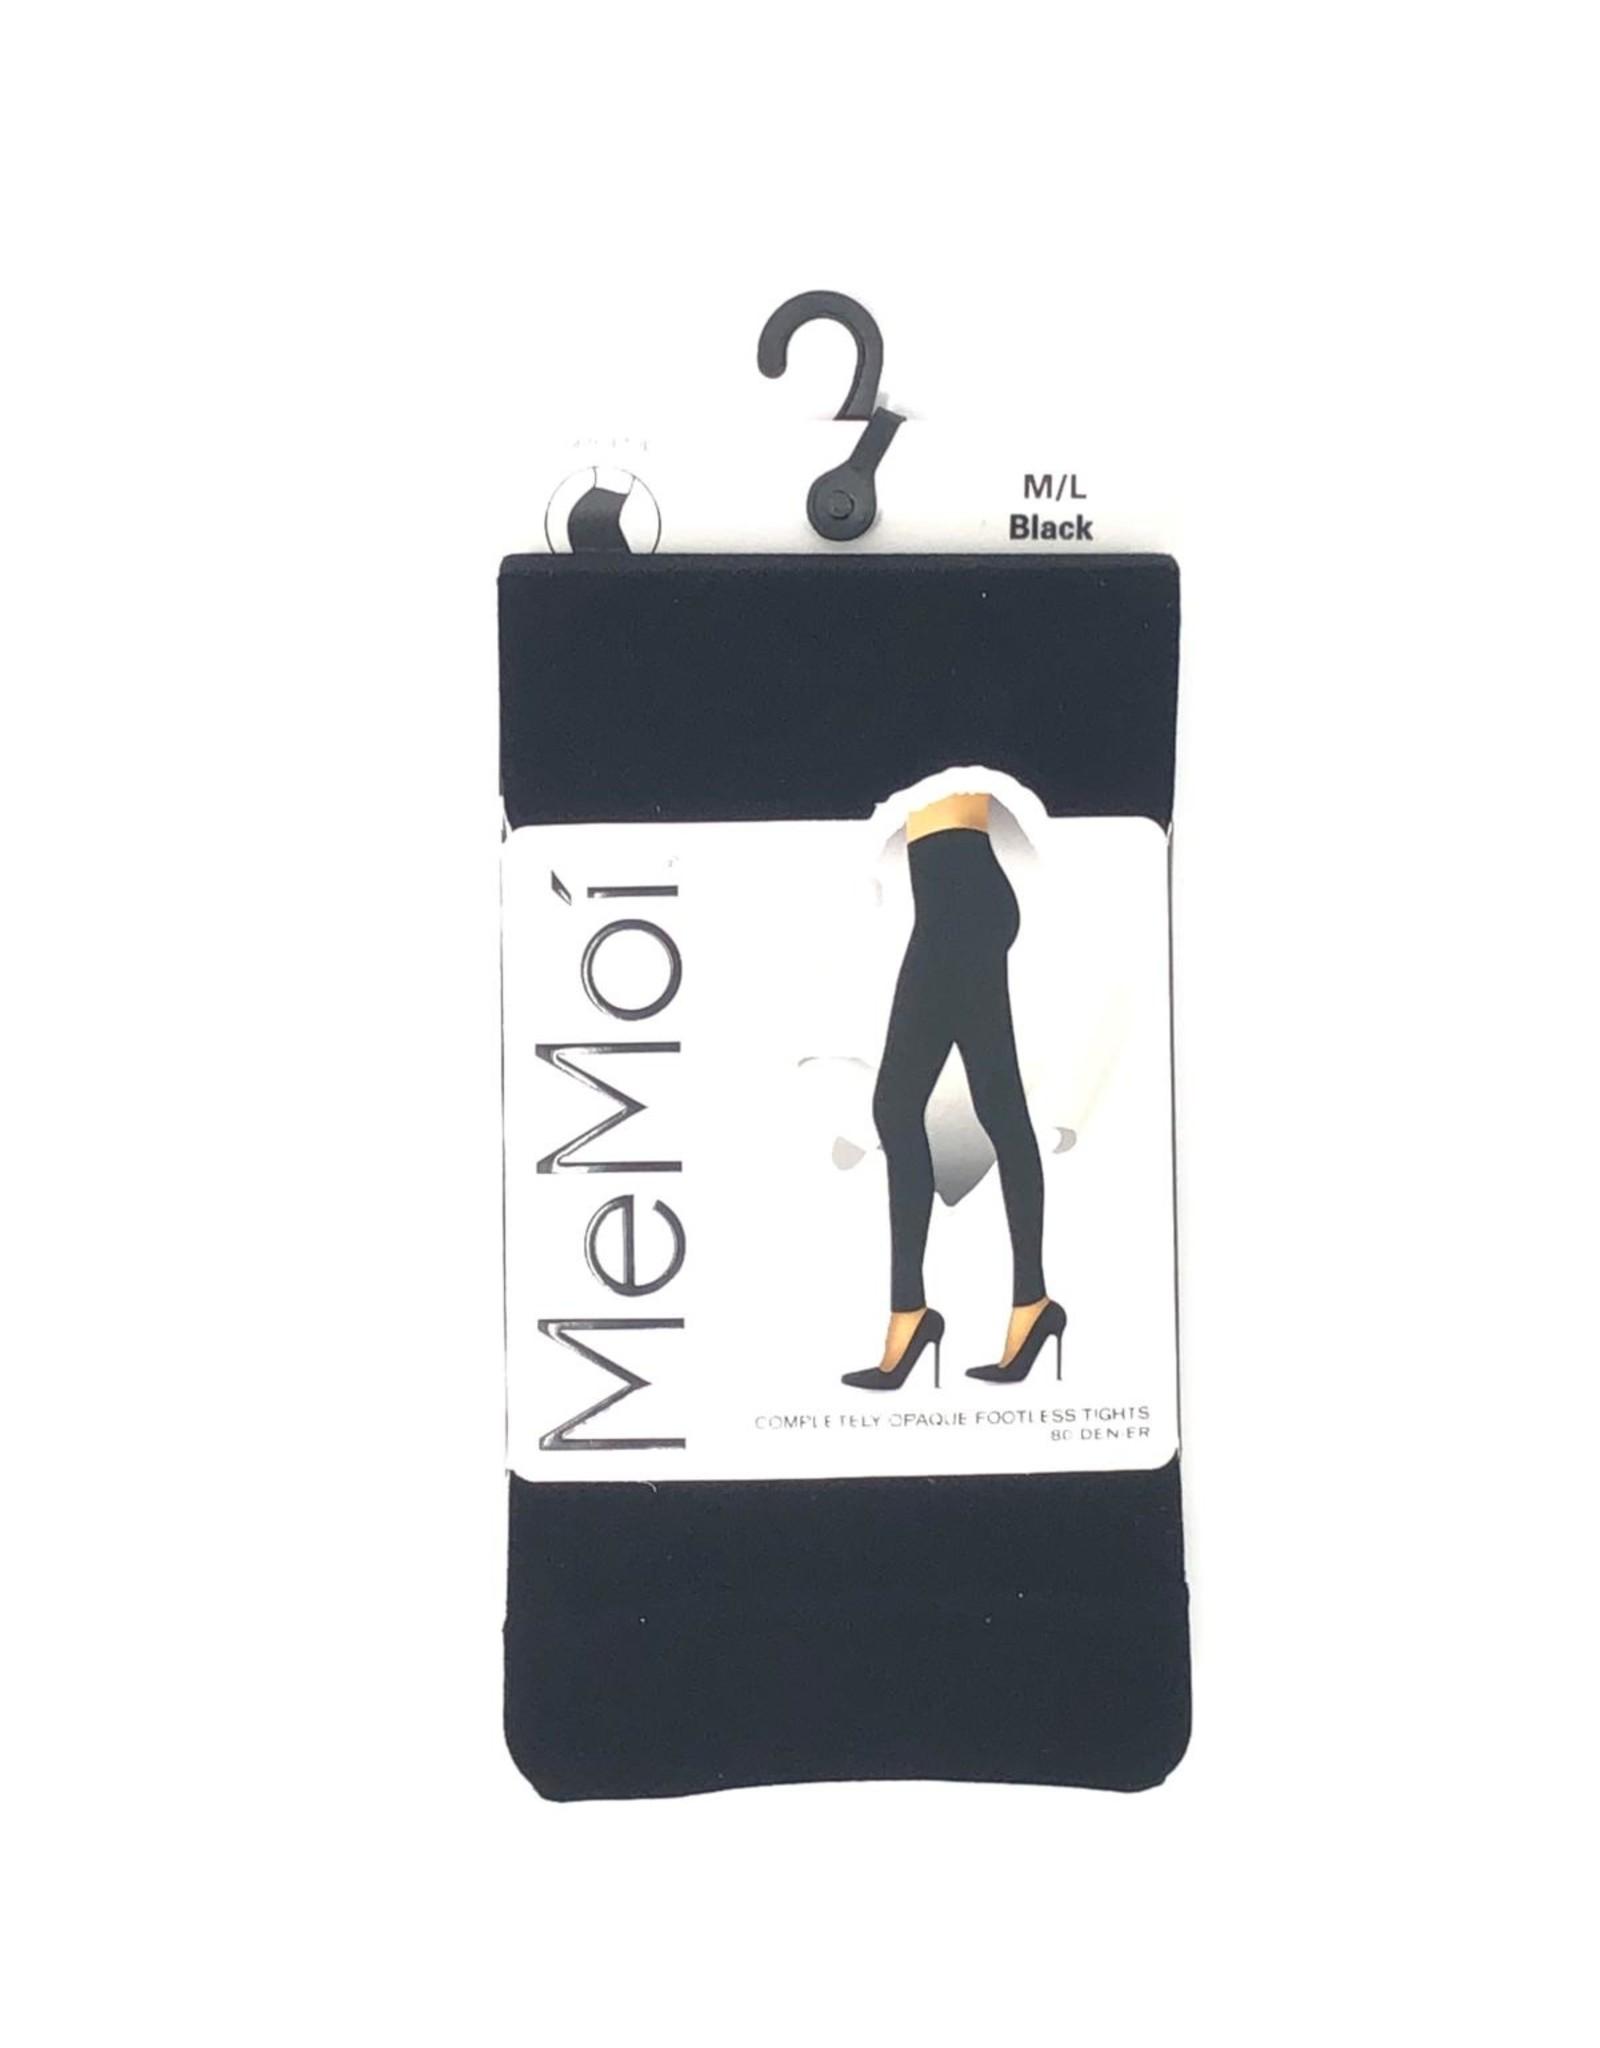 Memoi Memoi Completely Opaque Footless Tights 80 Denier